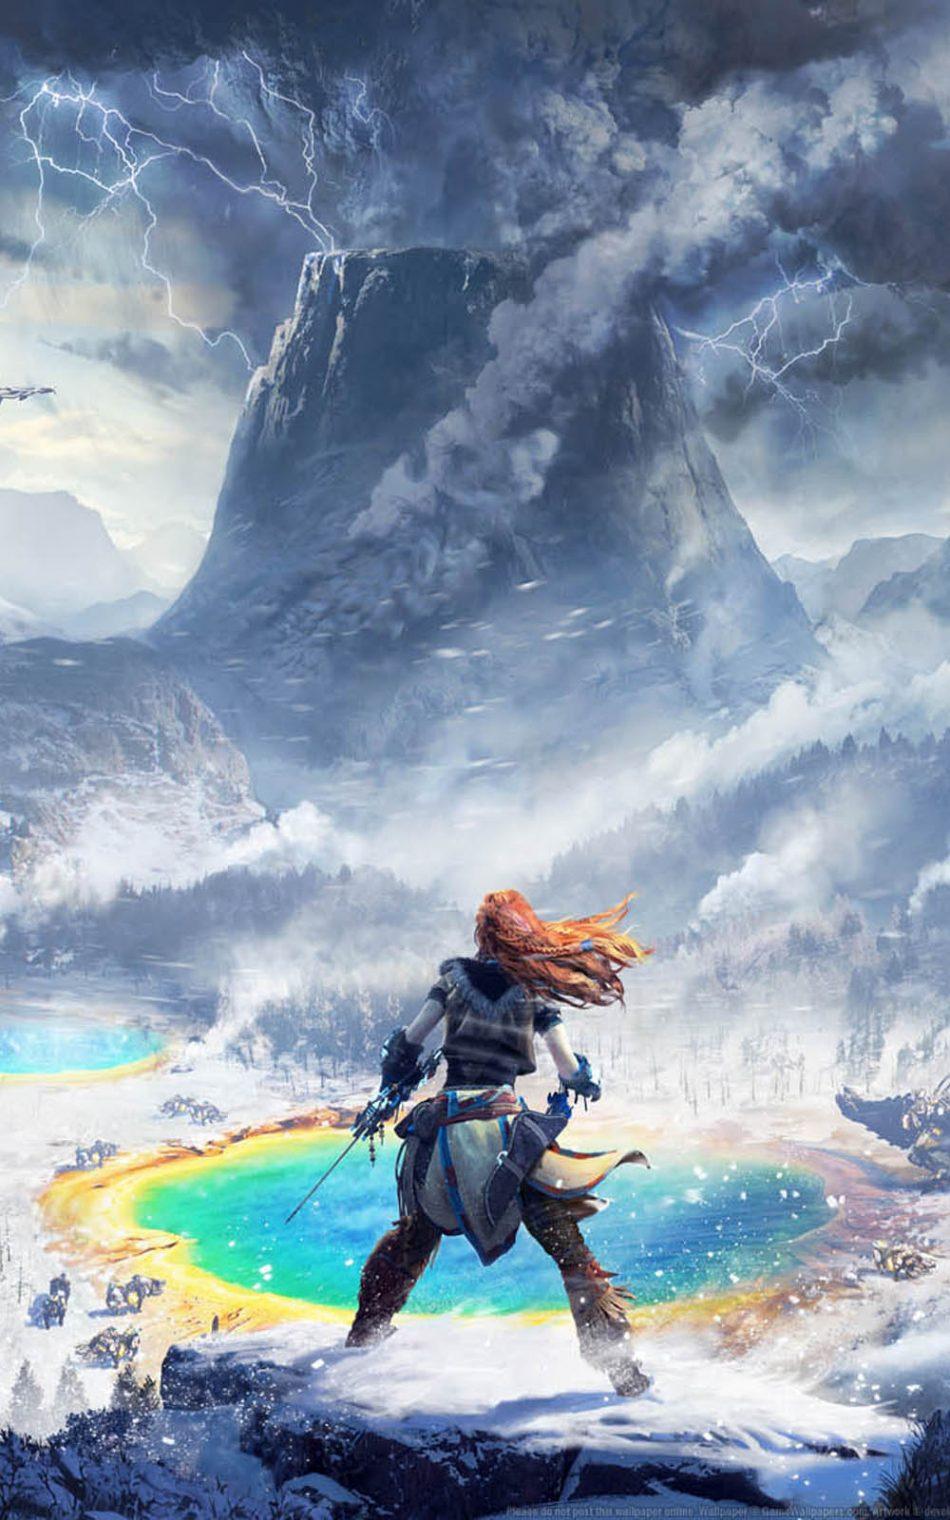 Horizon Zero Dawn - The Frozen Wilds 4K Ultra HD Mobile Wallpaper